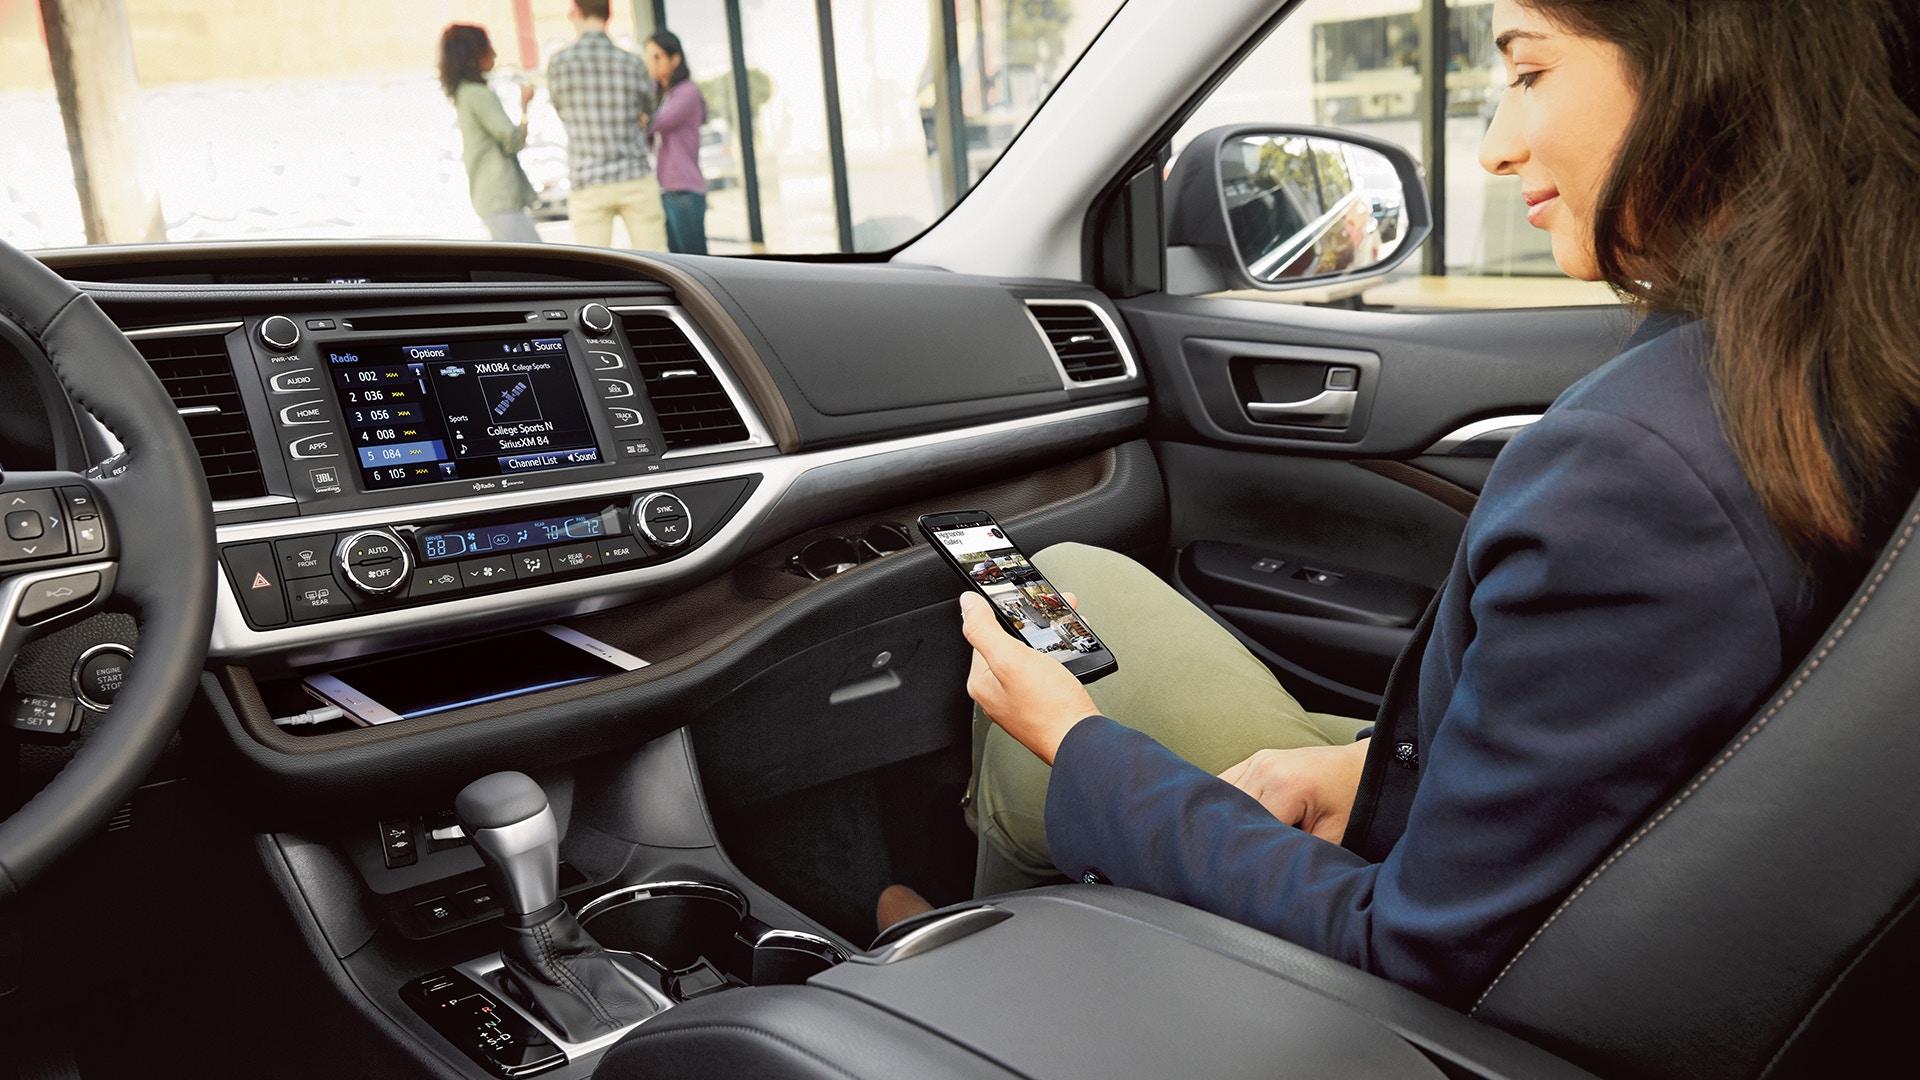 2019 Toyota Highlander Cockpit